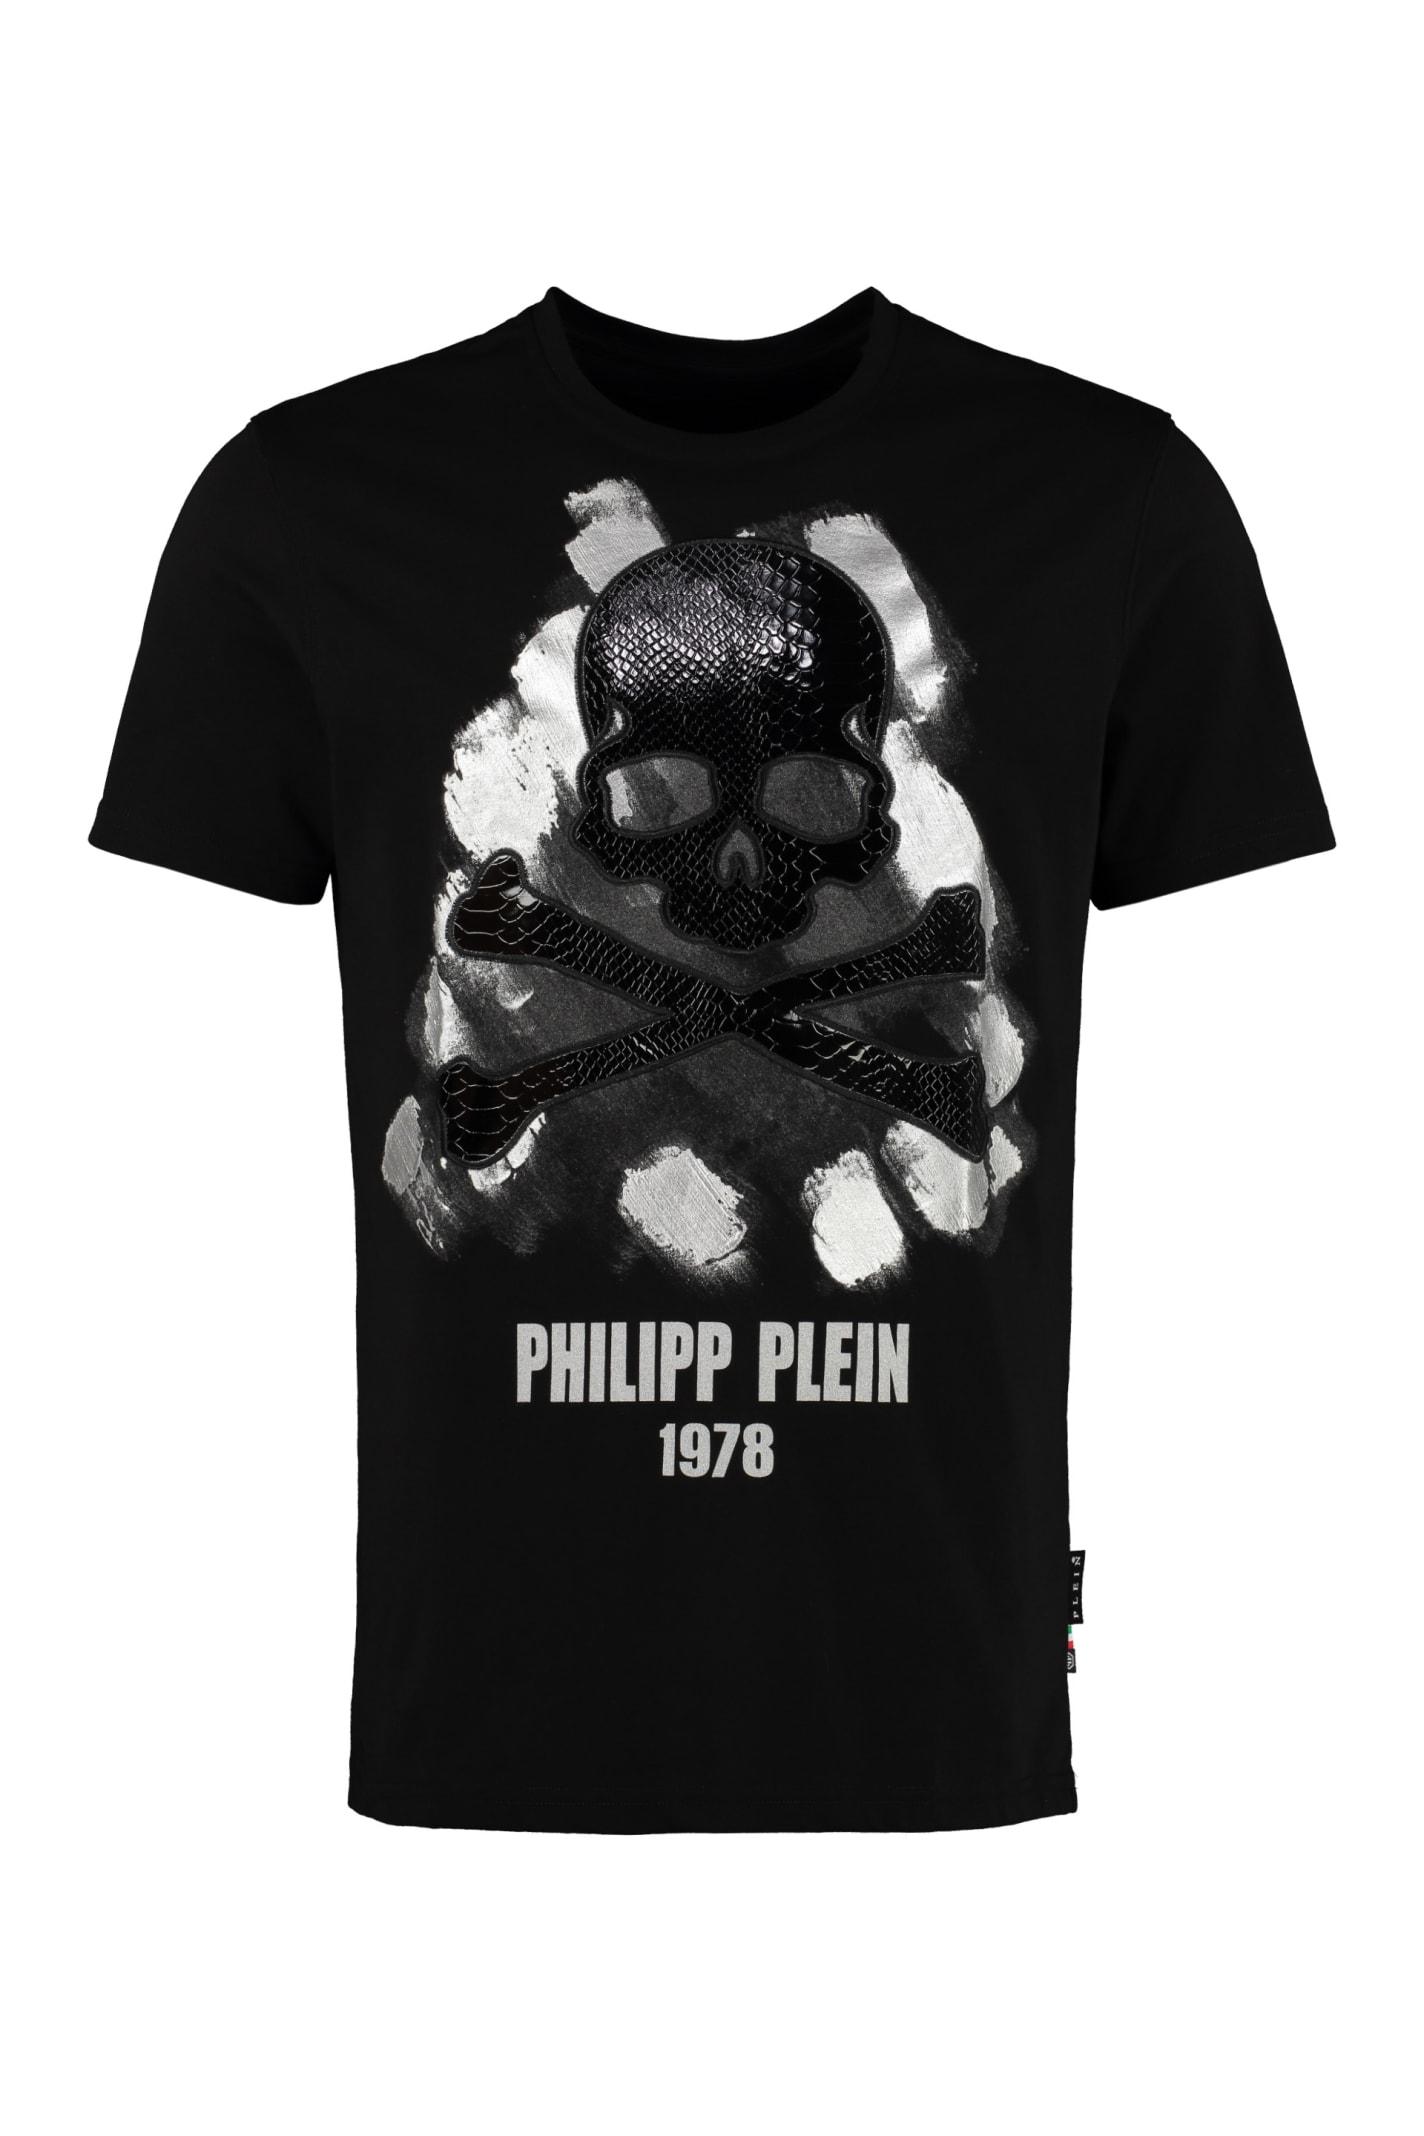 philipp plein skull print t shirt, Philipp Plein 'Superstar